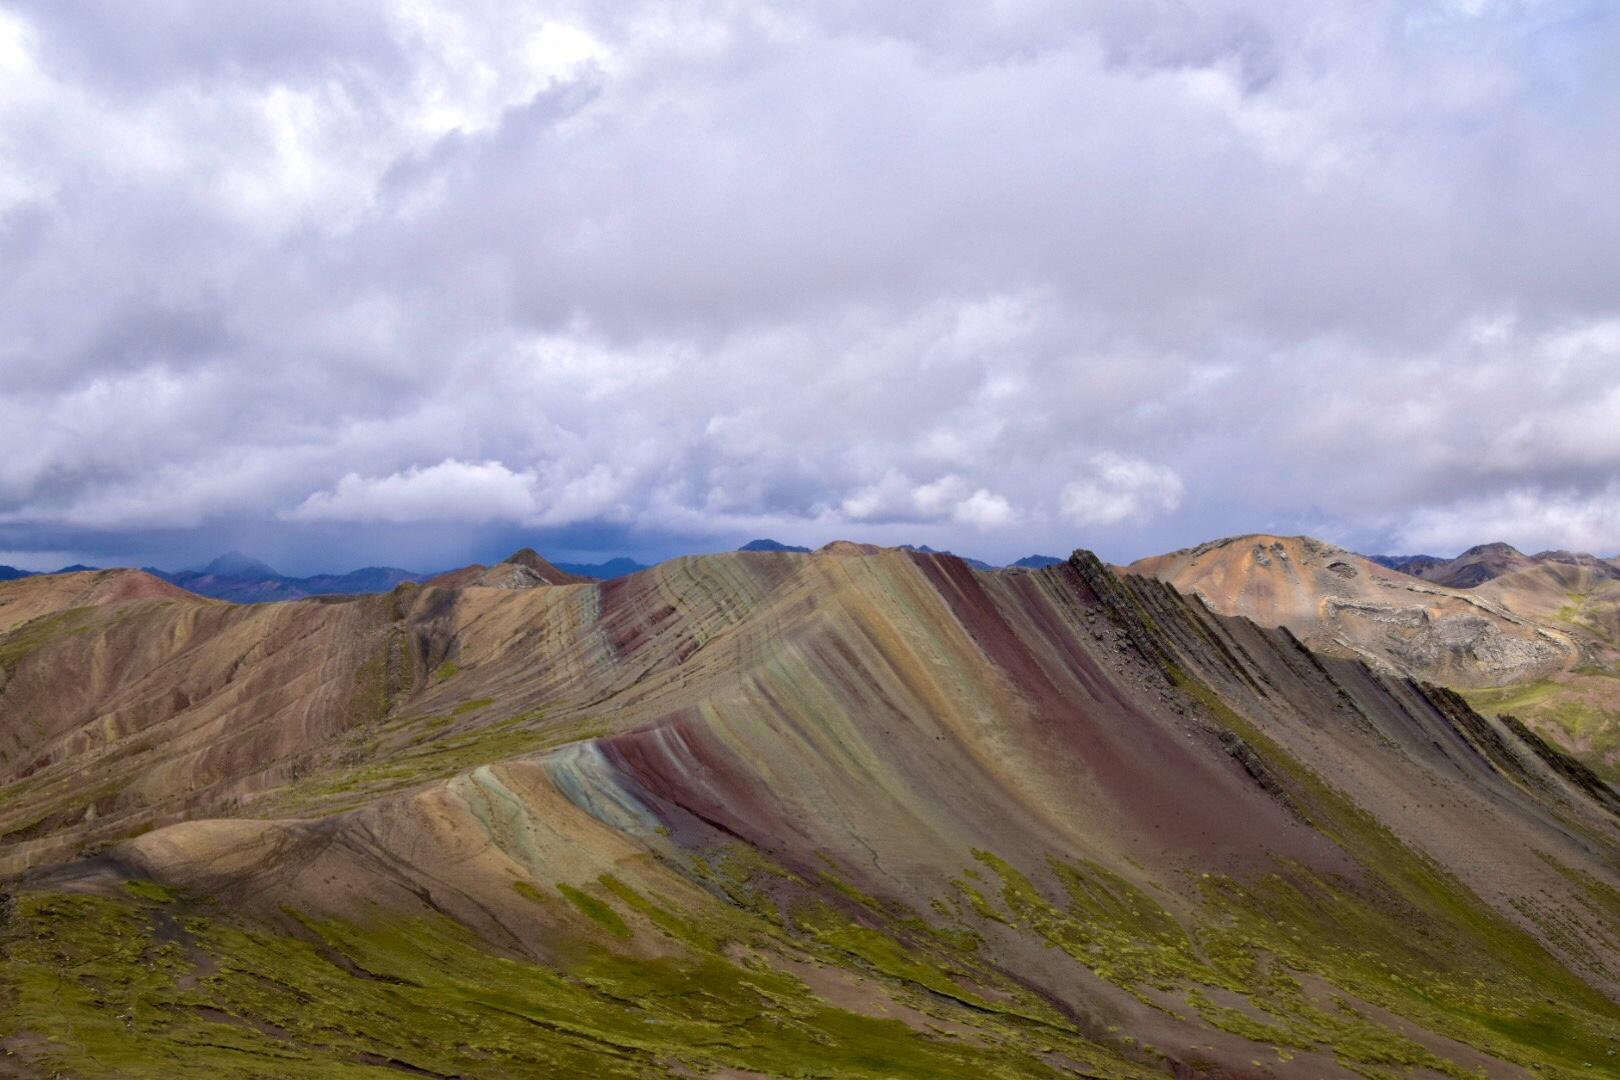 reisebericht-erlebnisreise-suedamerika-sara-rainbow-mountain-3